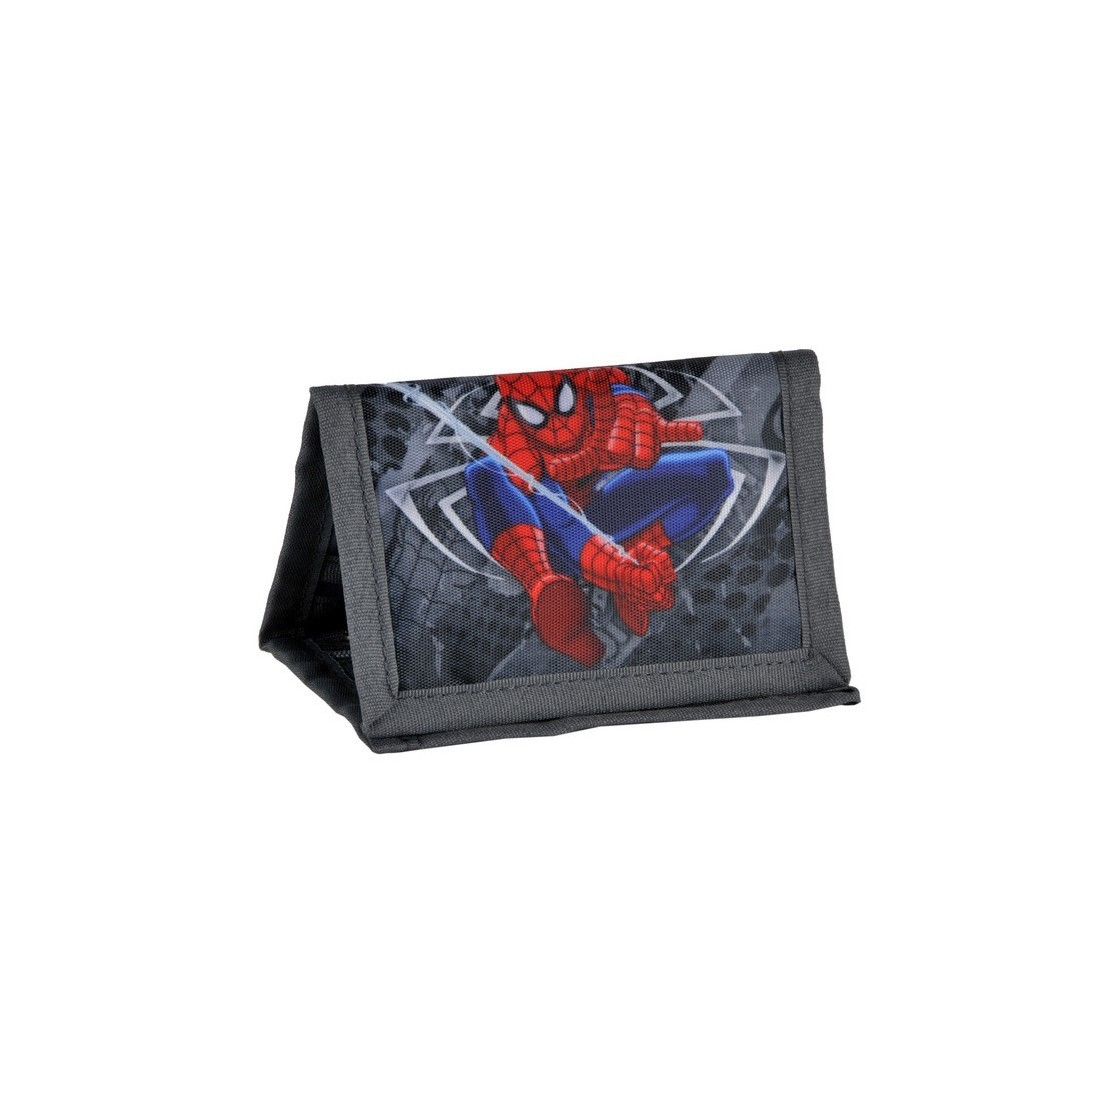 Portfel Spider-Man szary - plecak-tornister.pl